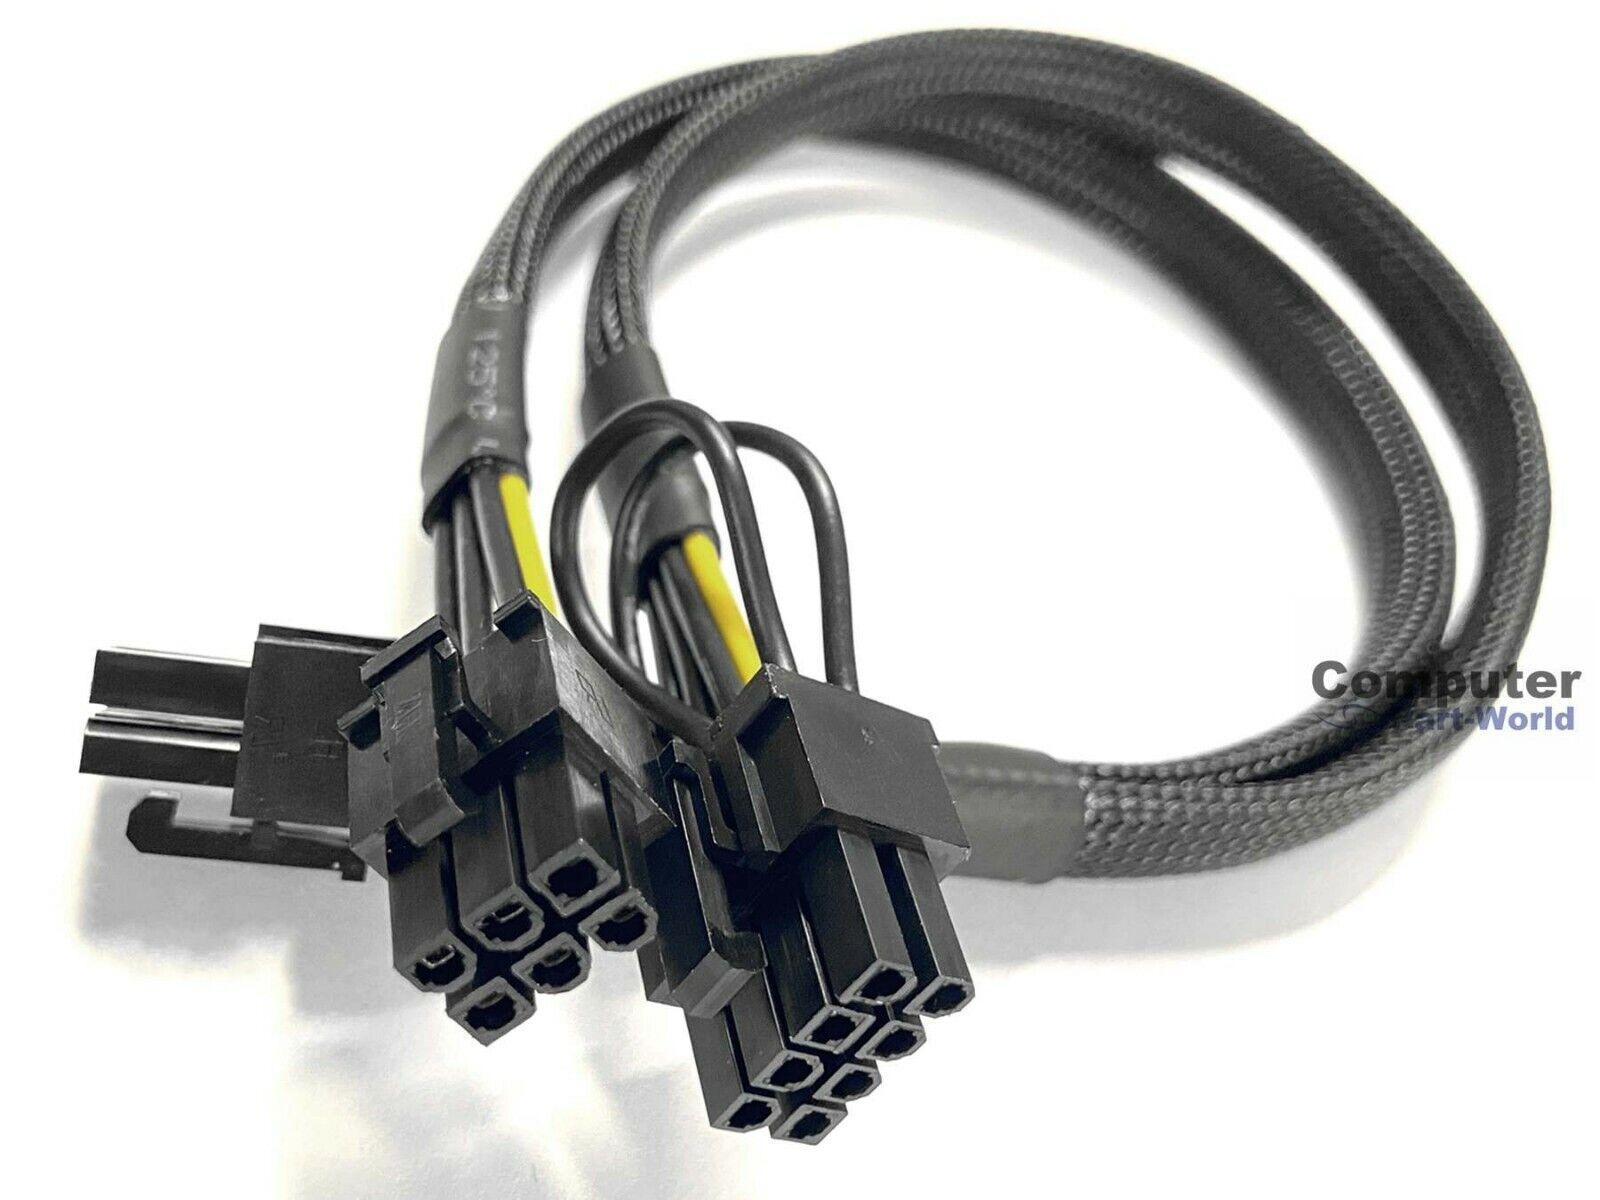 8+6pin PCI-E VGA Power Supply Cable for Antec HCG850 Gold and GPU 50cm